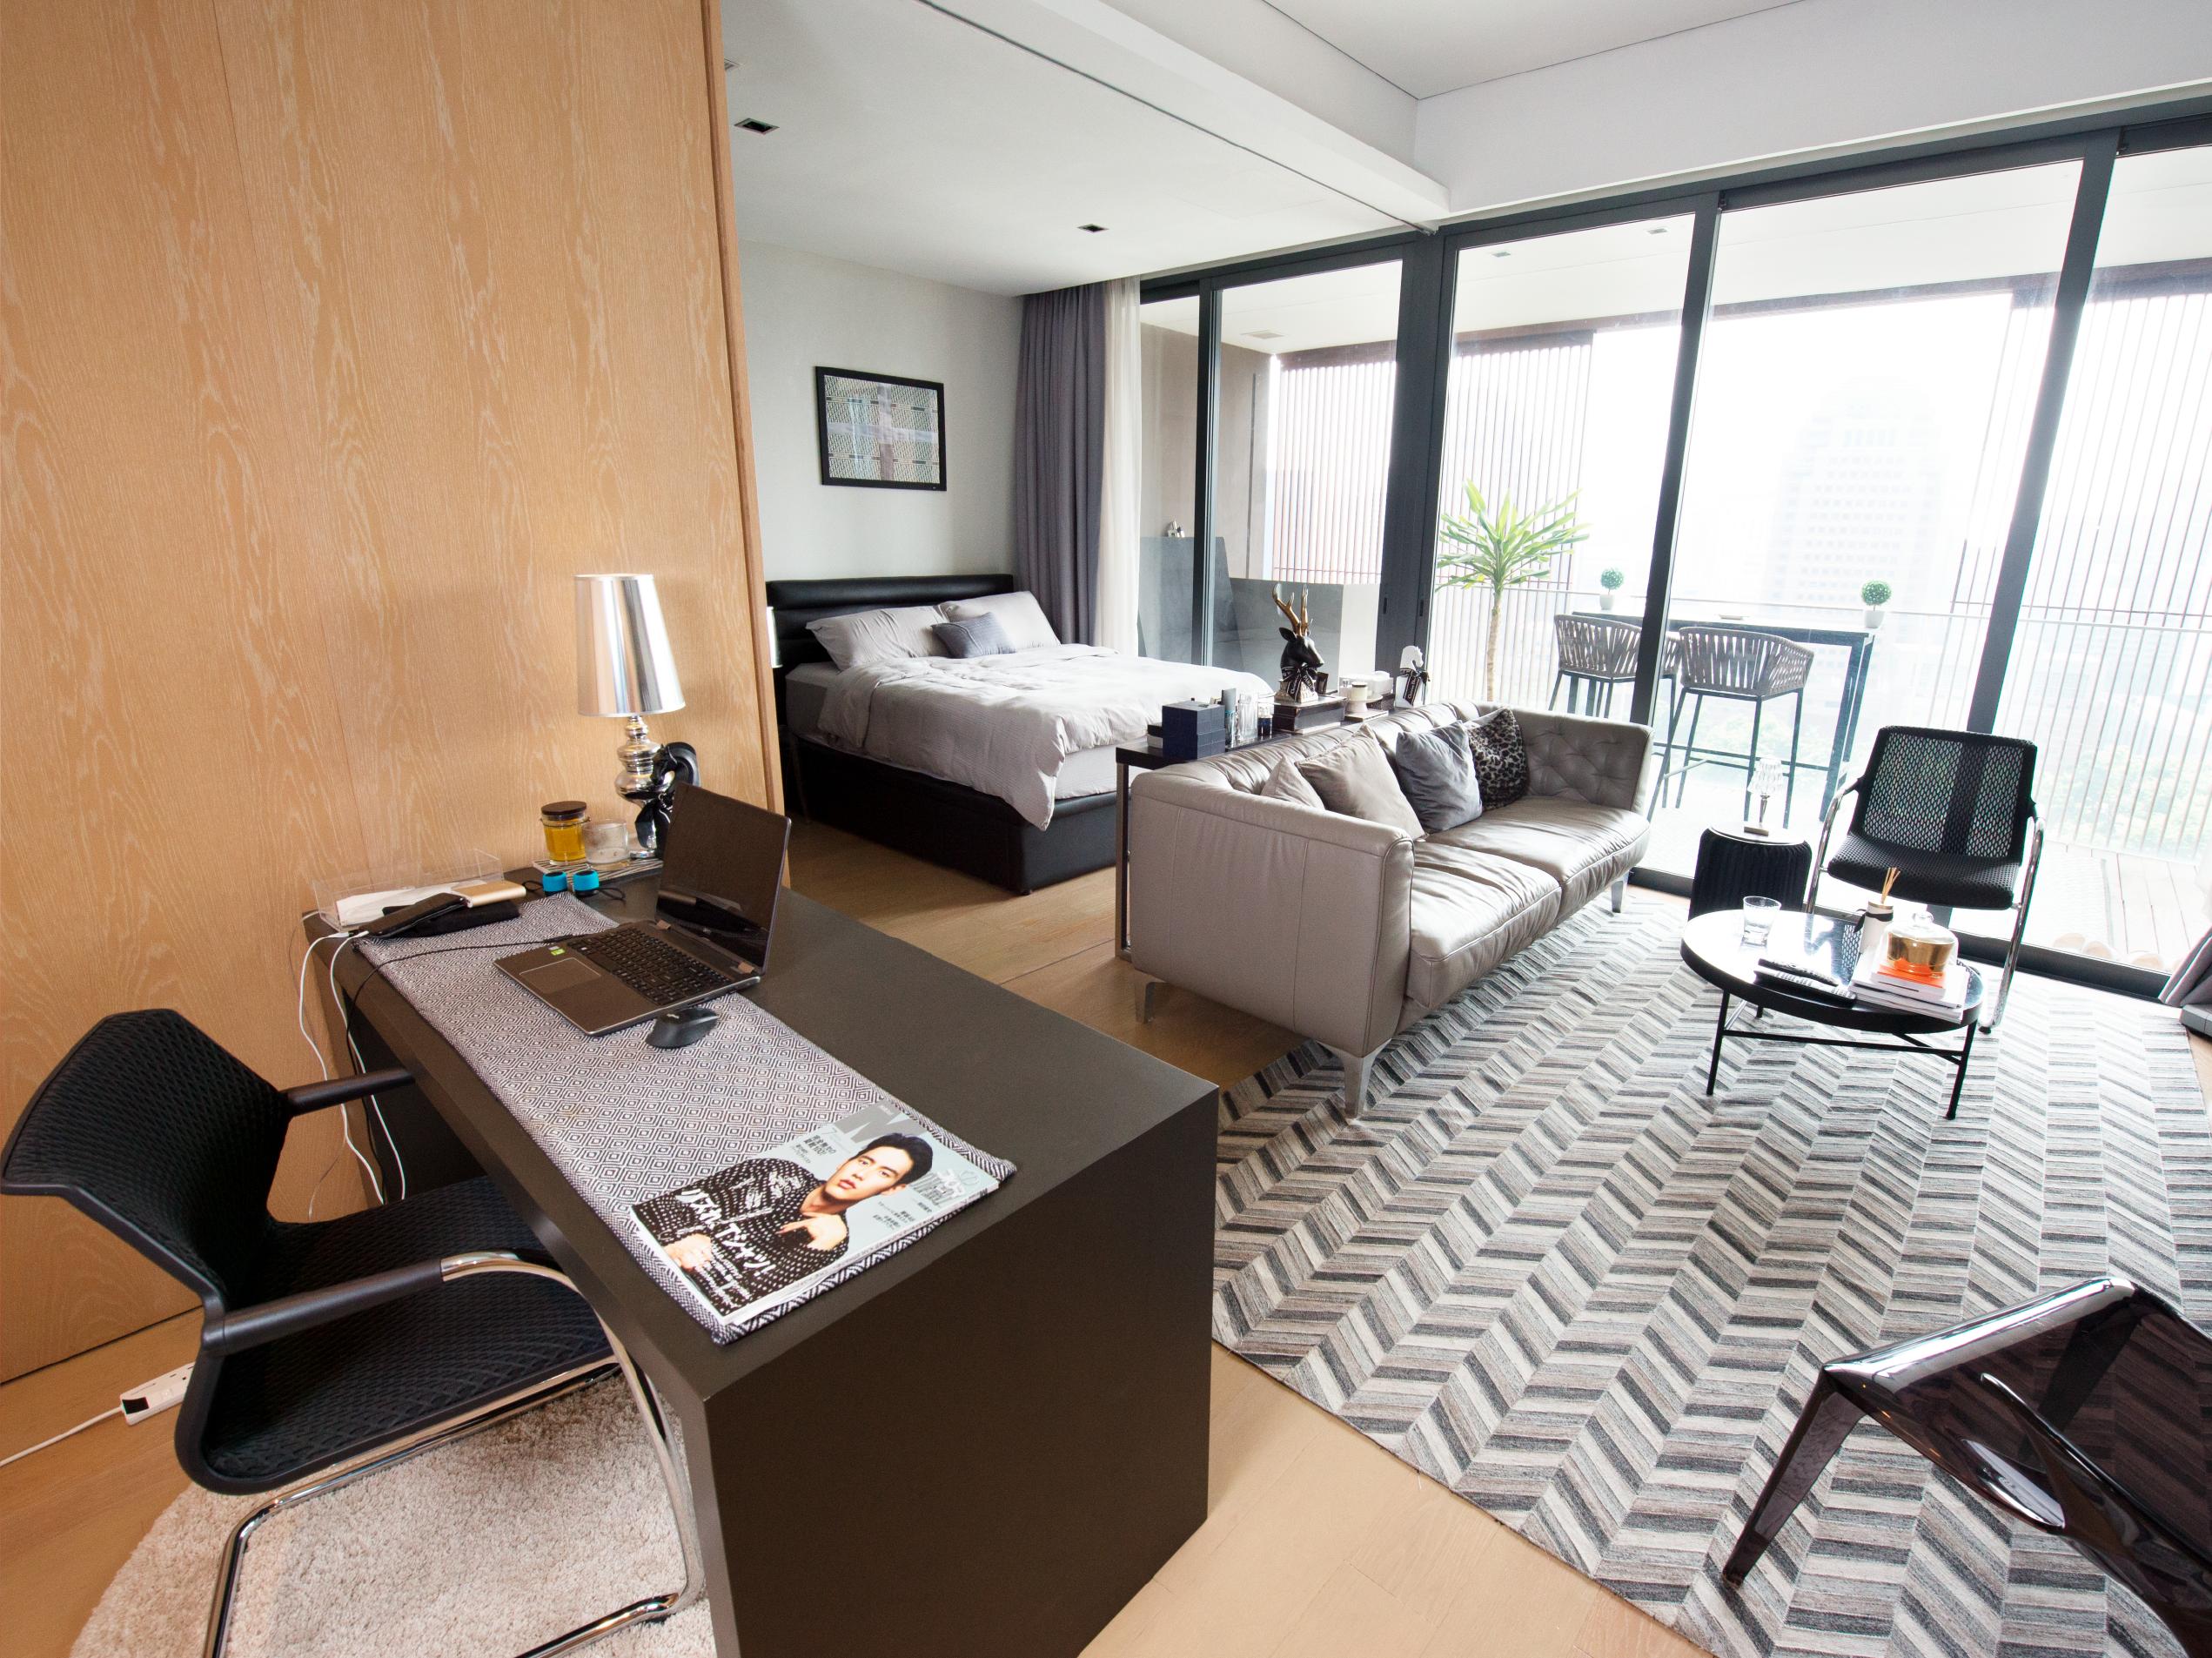 One-bedroom condominium in Orchard